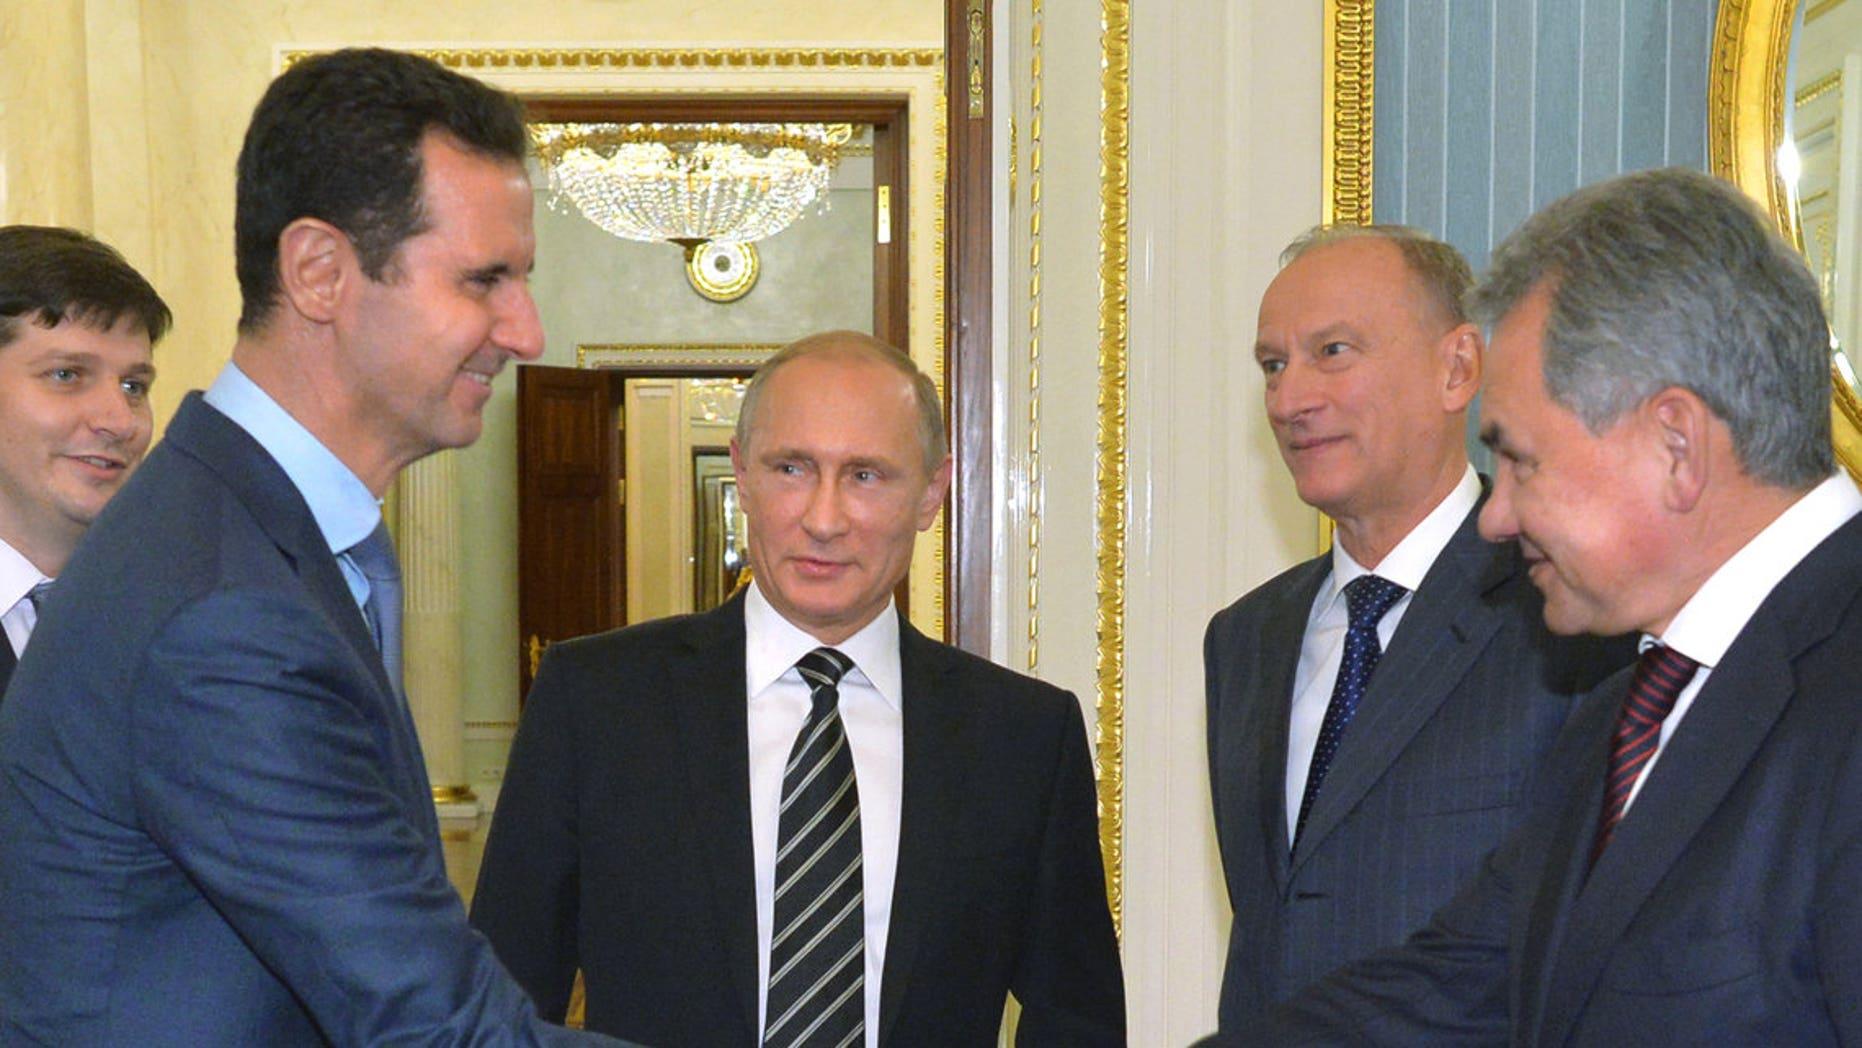 Assad, second left, shakes hand with Shoigu as Russian President Vladimir Putin, center, looks on, in October 2015.